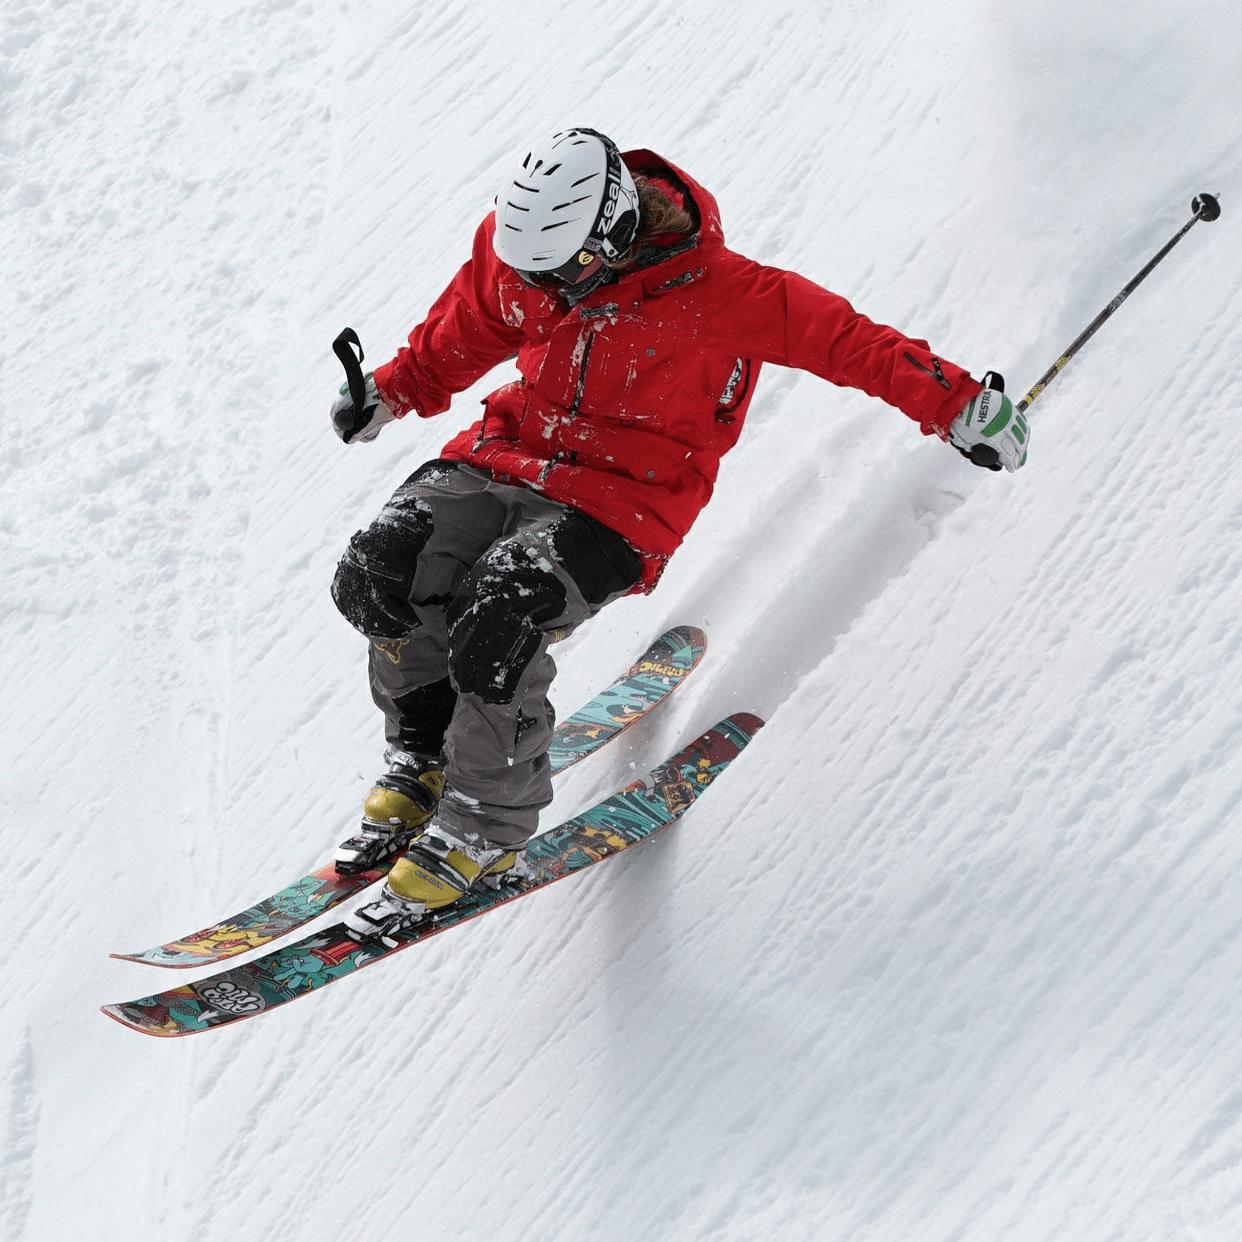 Snow Sports: Pre-Season Training Part II